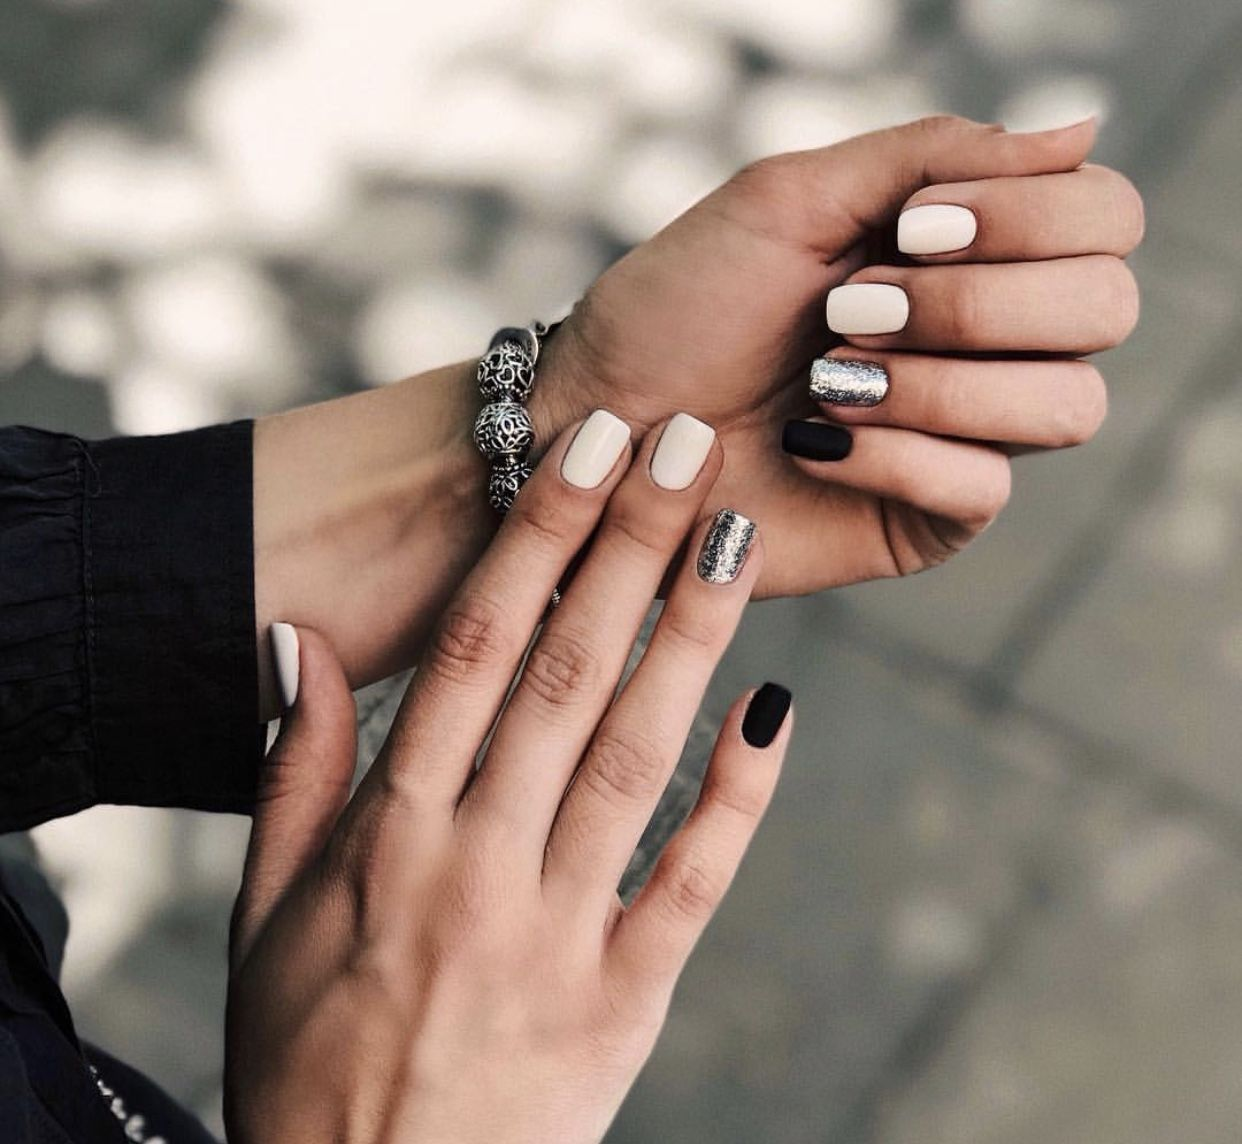 Pin By Simona Helesicova On Nails With Images Design Nehtu Gelove Nehty Nehet